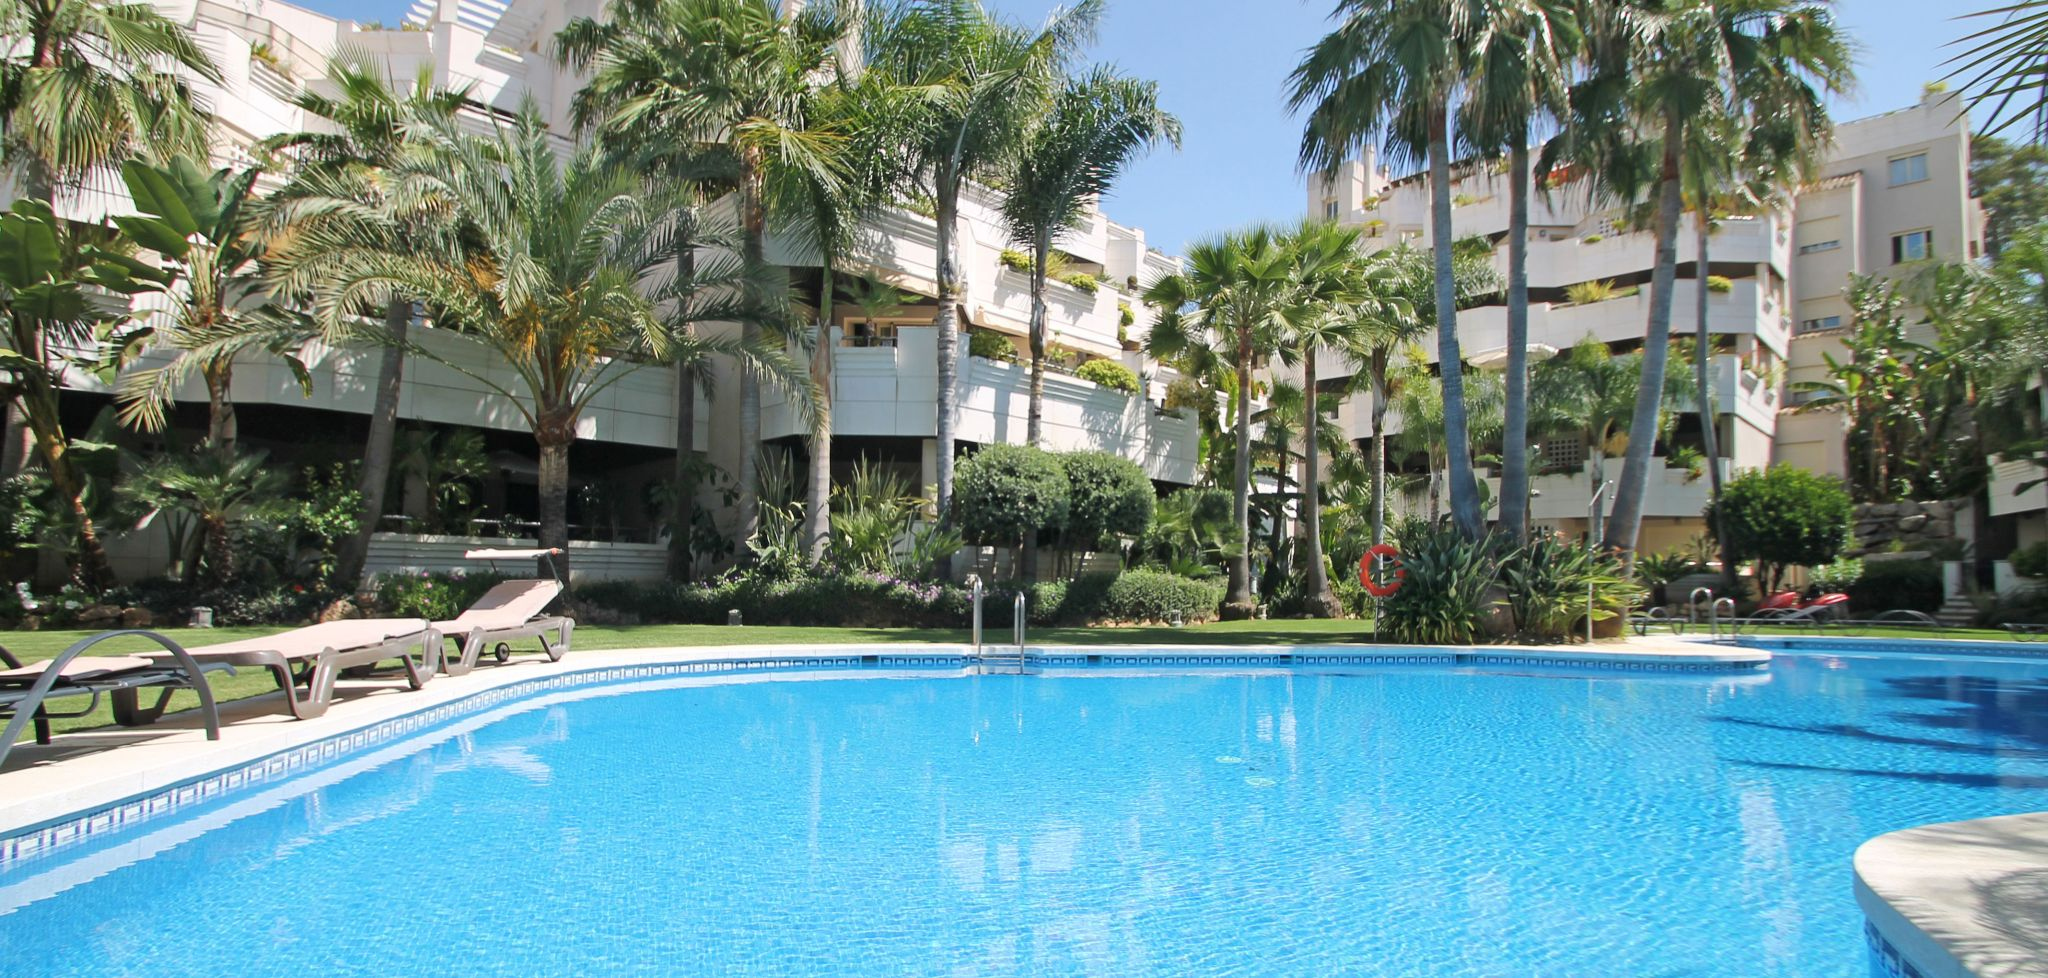 Modern two bedroom apartment in Fuente Aloha, Marbella Nueva Andalucia